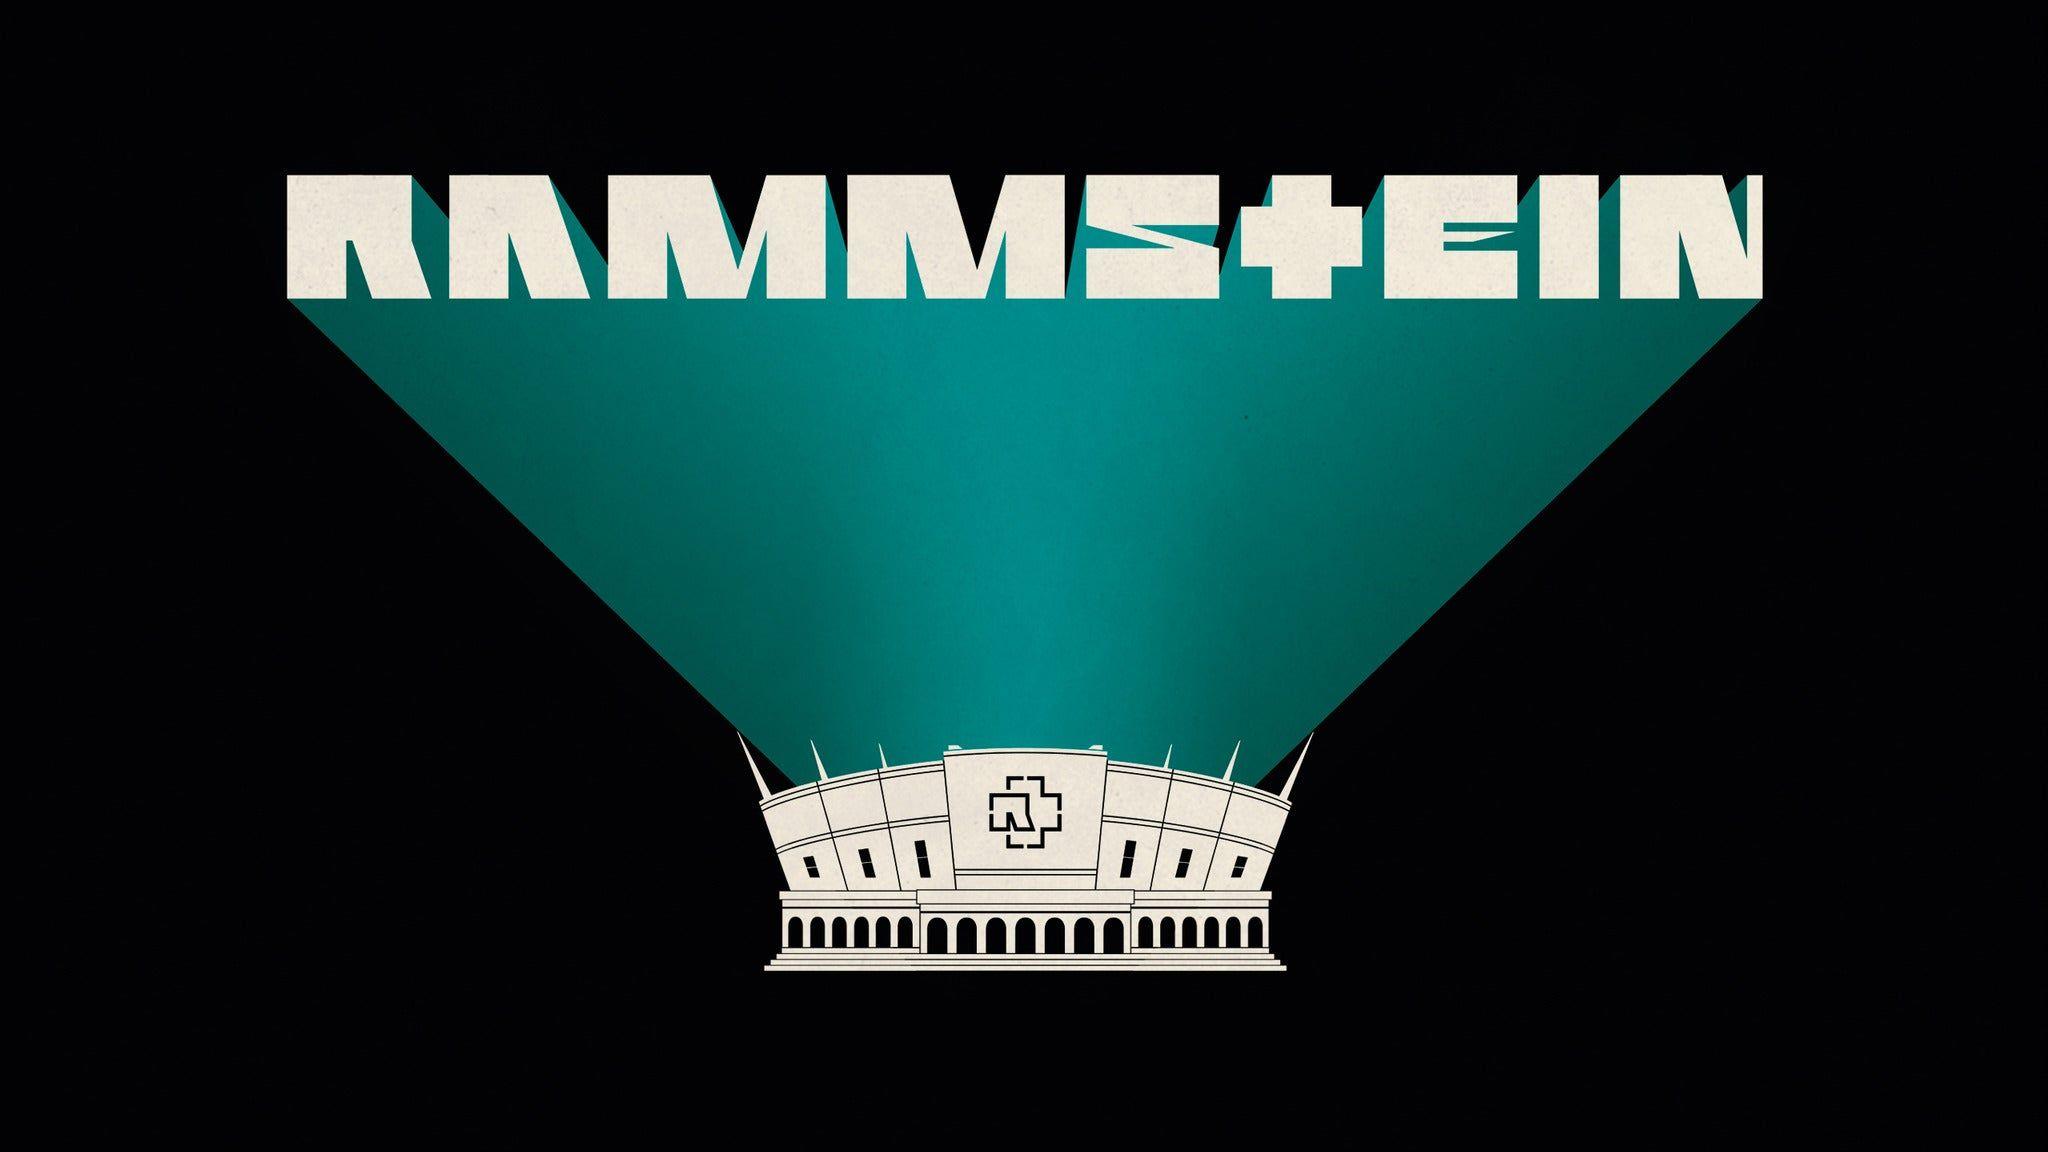 RAMMSTEIN - Europe Stadium Tour 2022 - dag 2